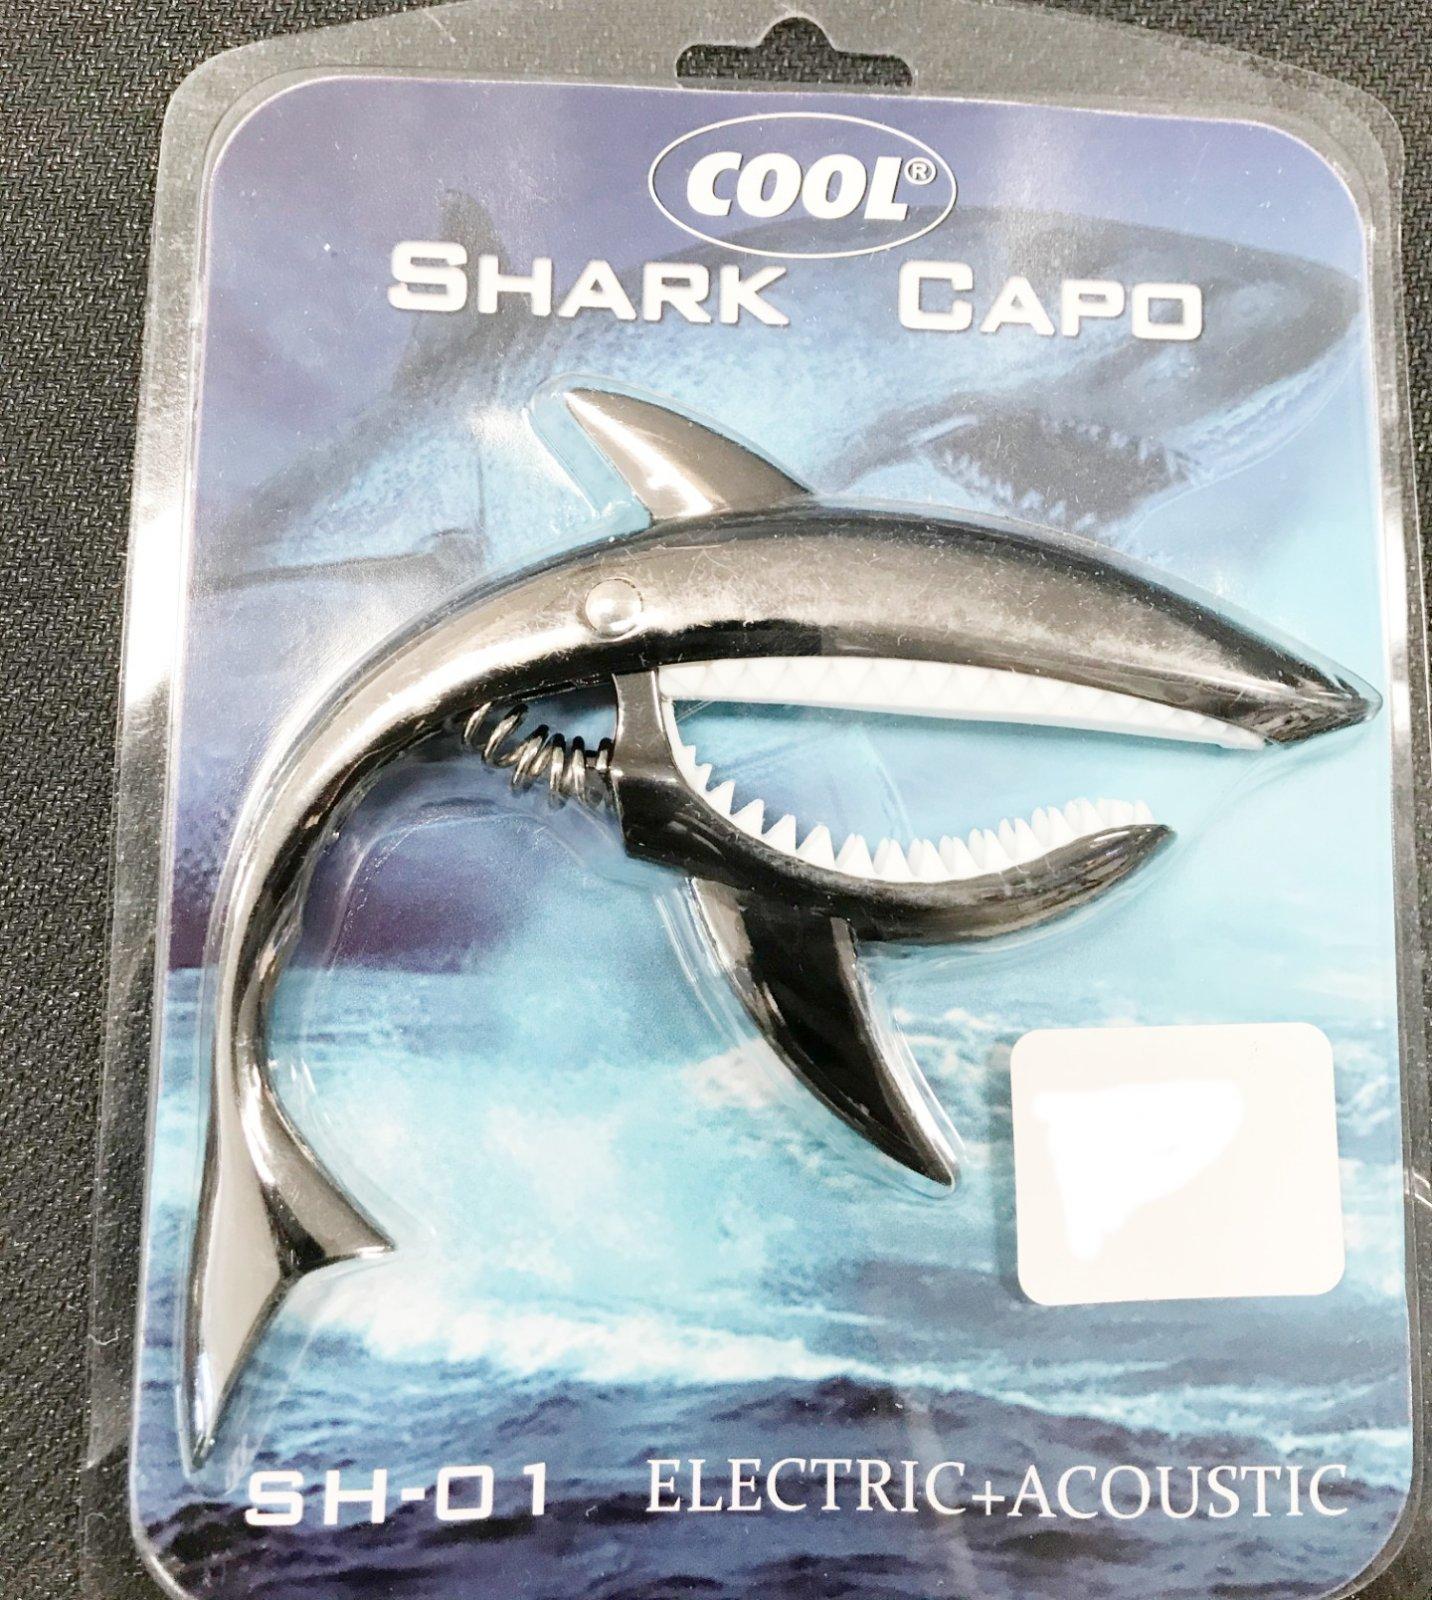 Cool shark capo